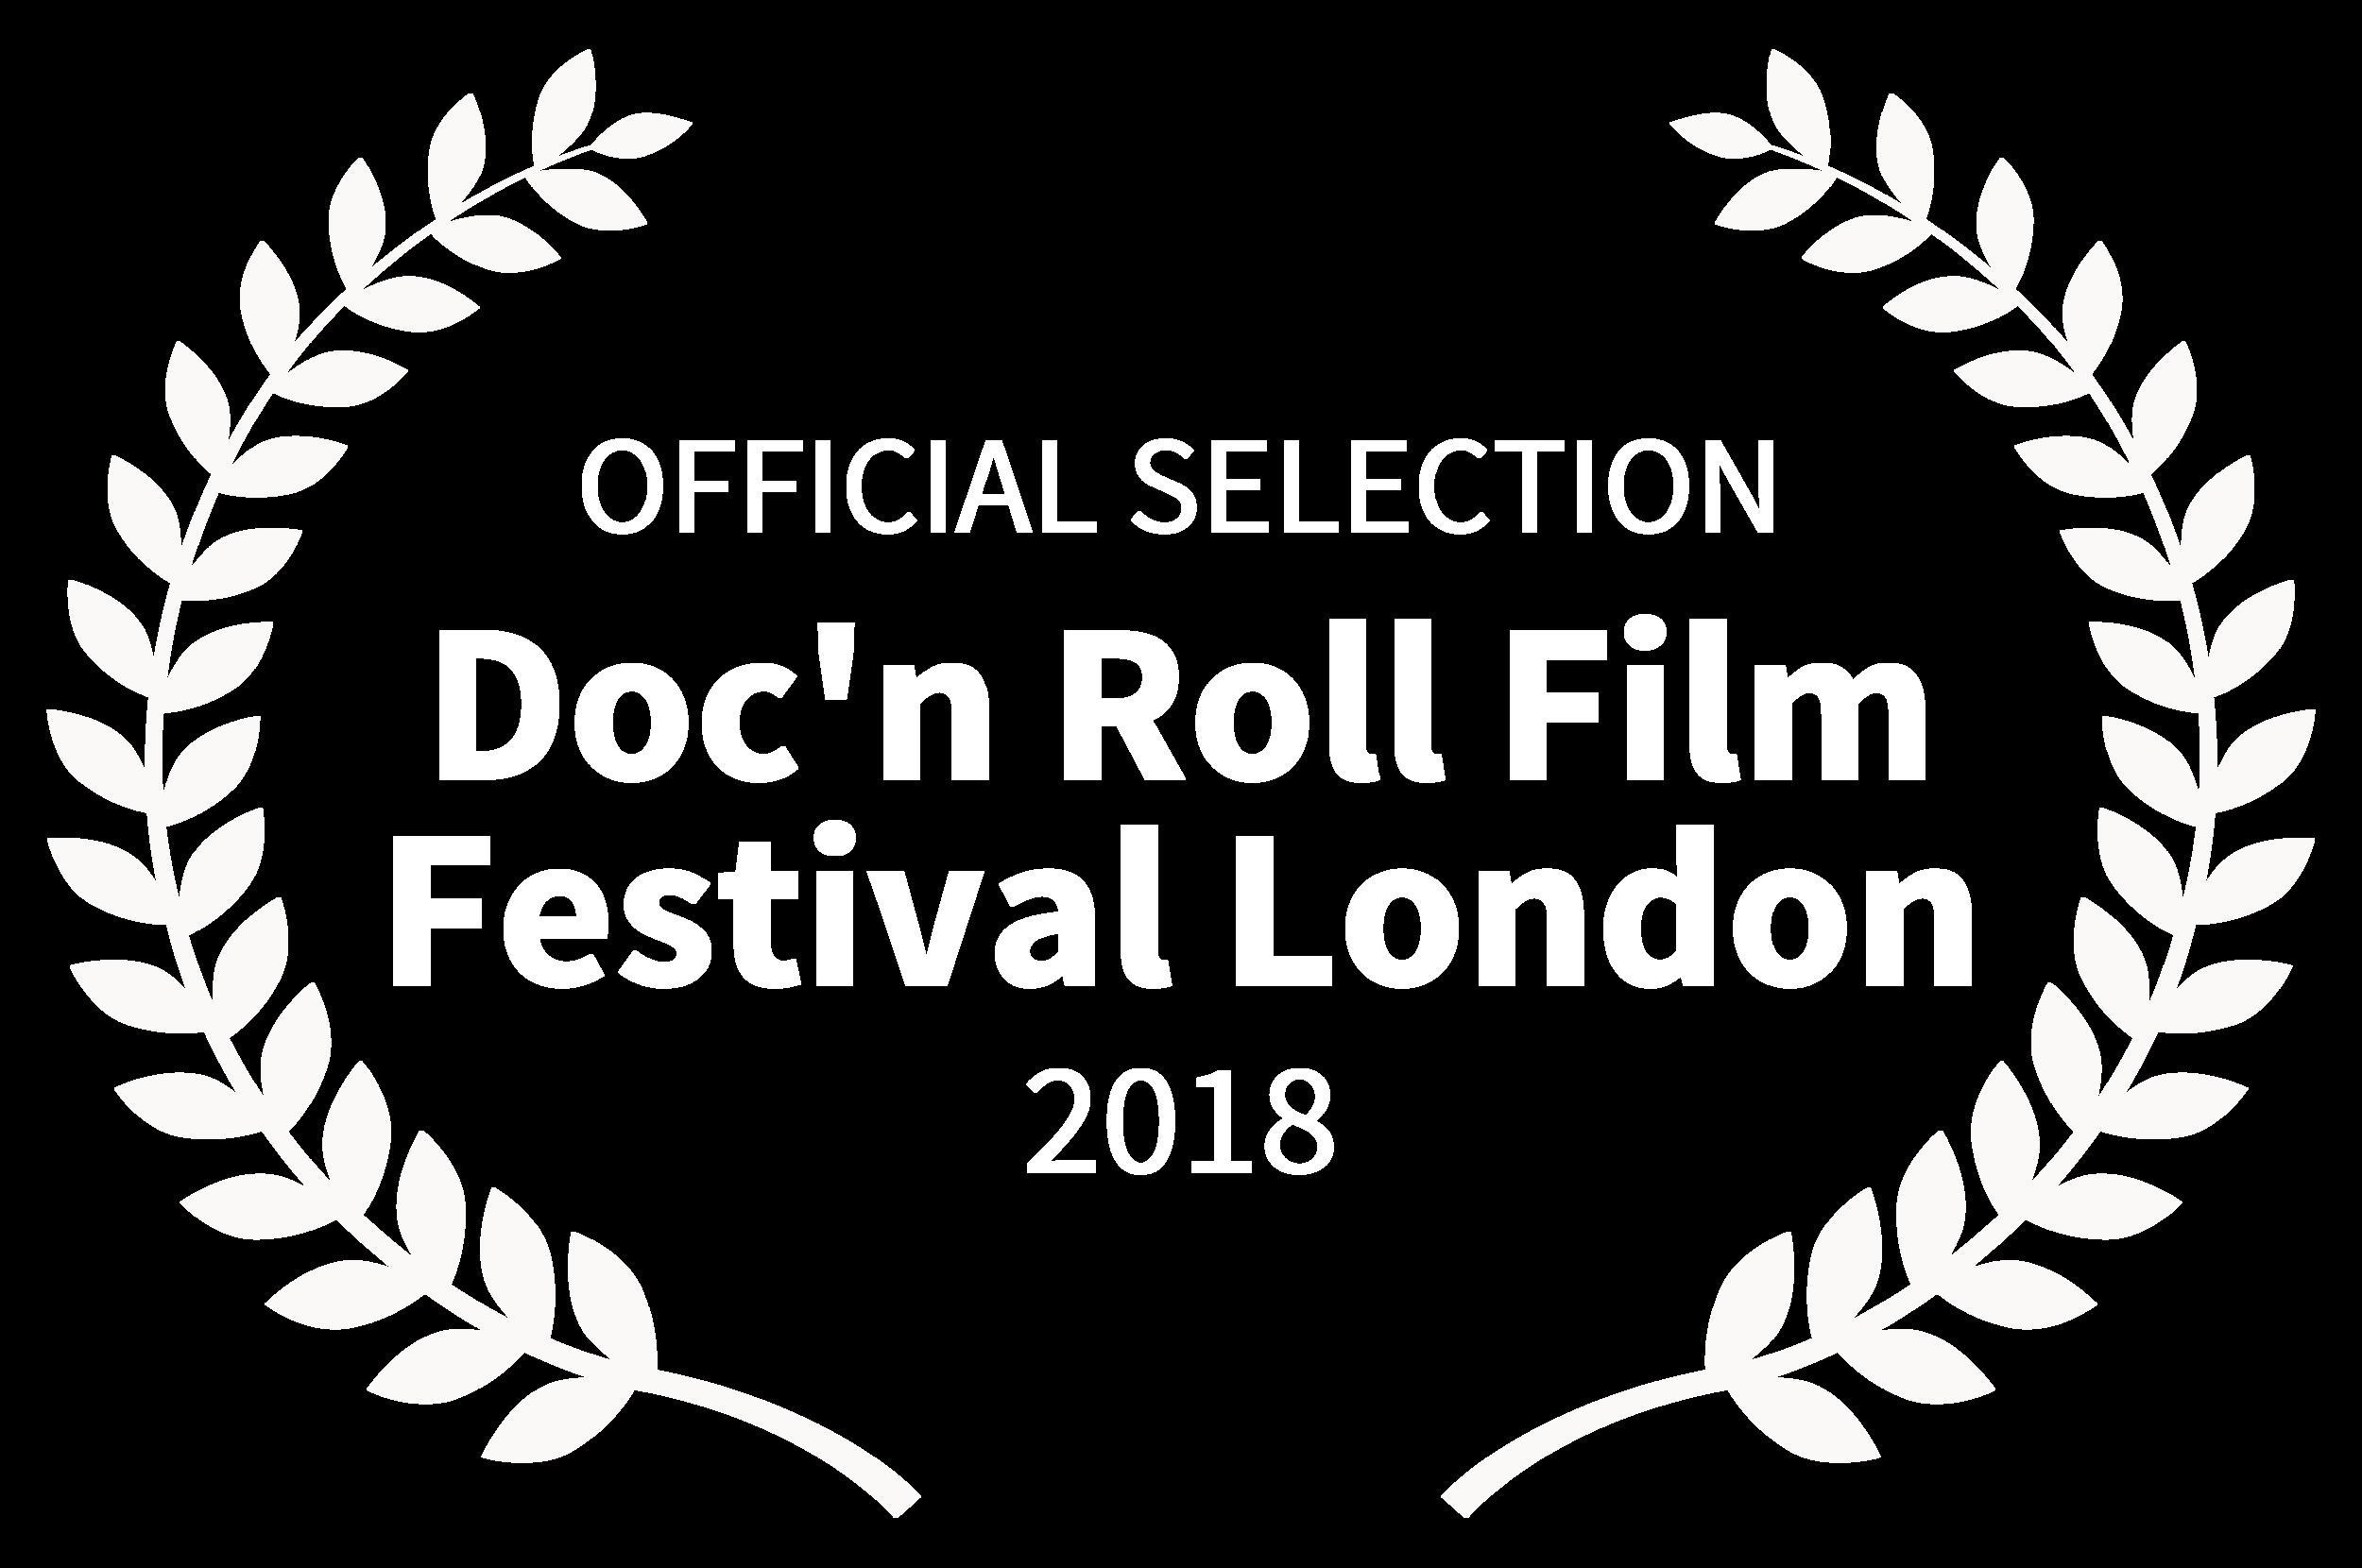 OFFICIALSELECTION-DocnRollFilmFestivalLondon-2018 2.png